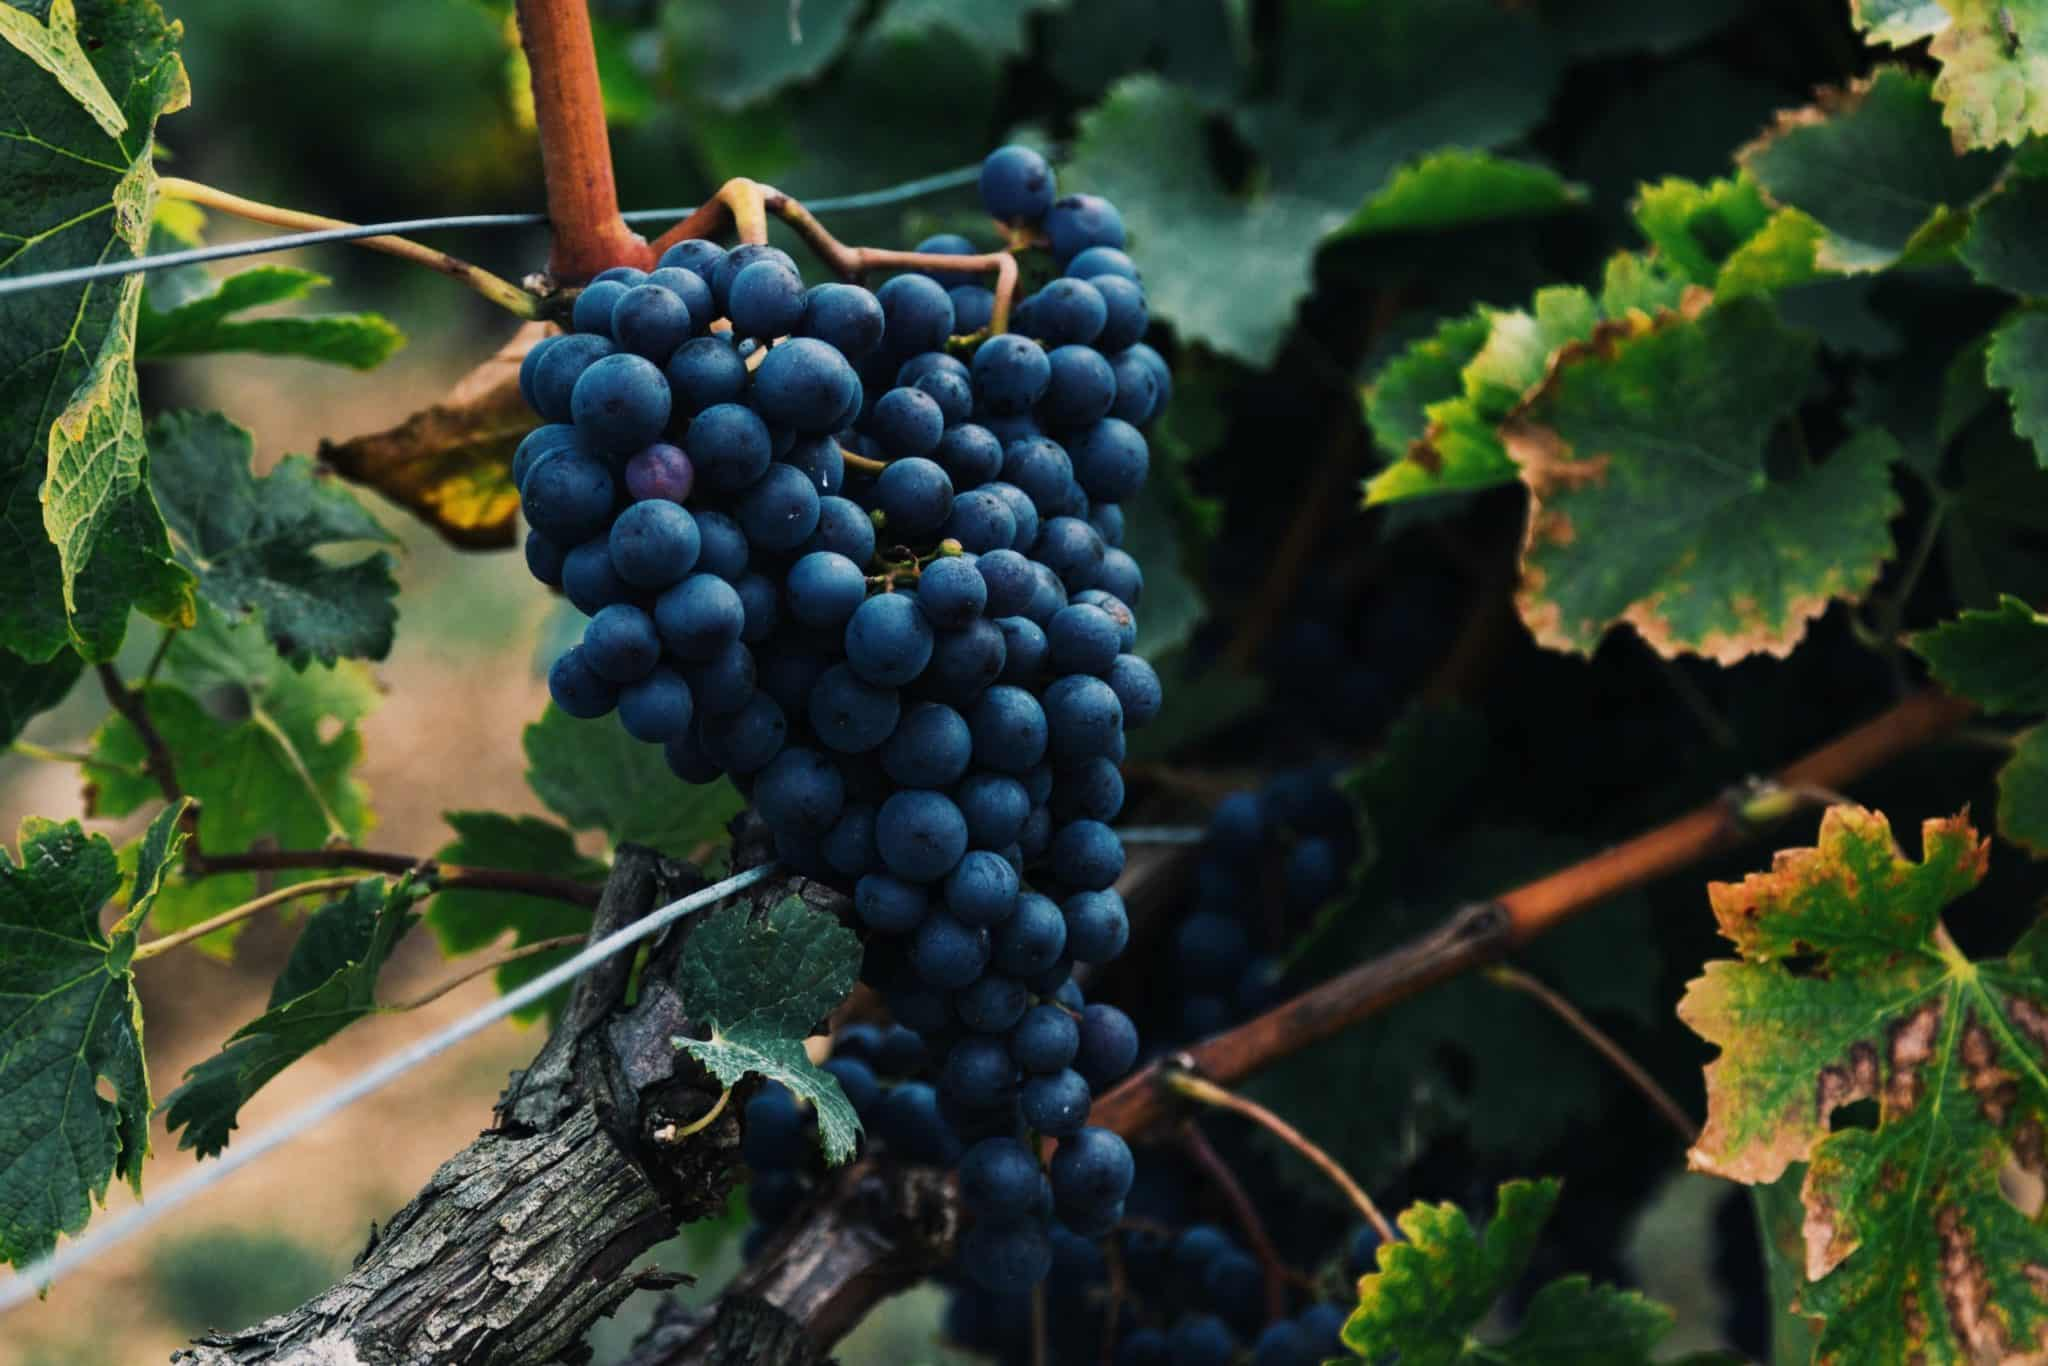 Blue plum grapes growing on a vine